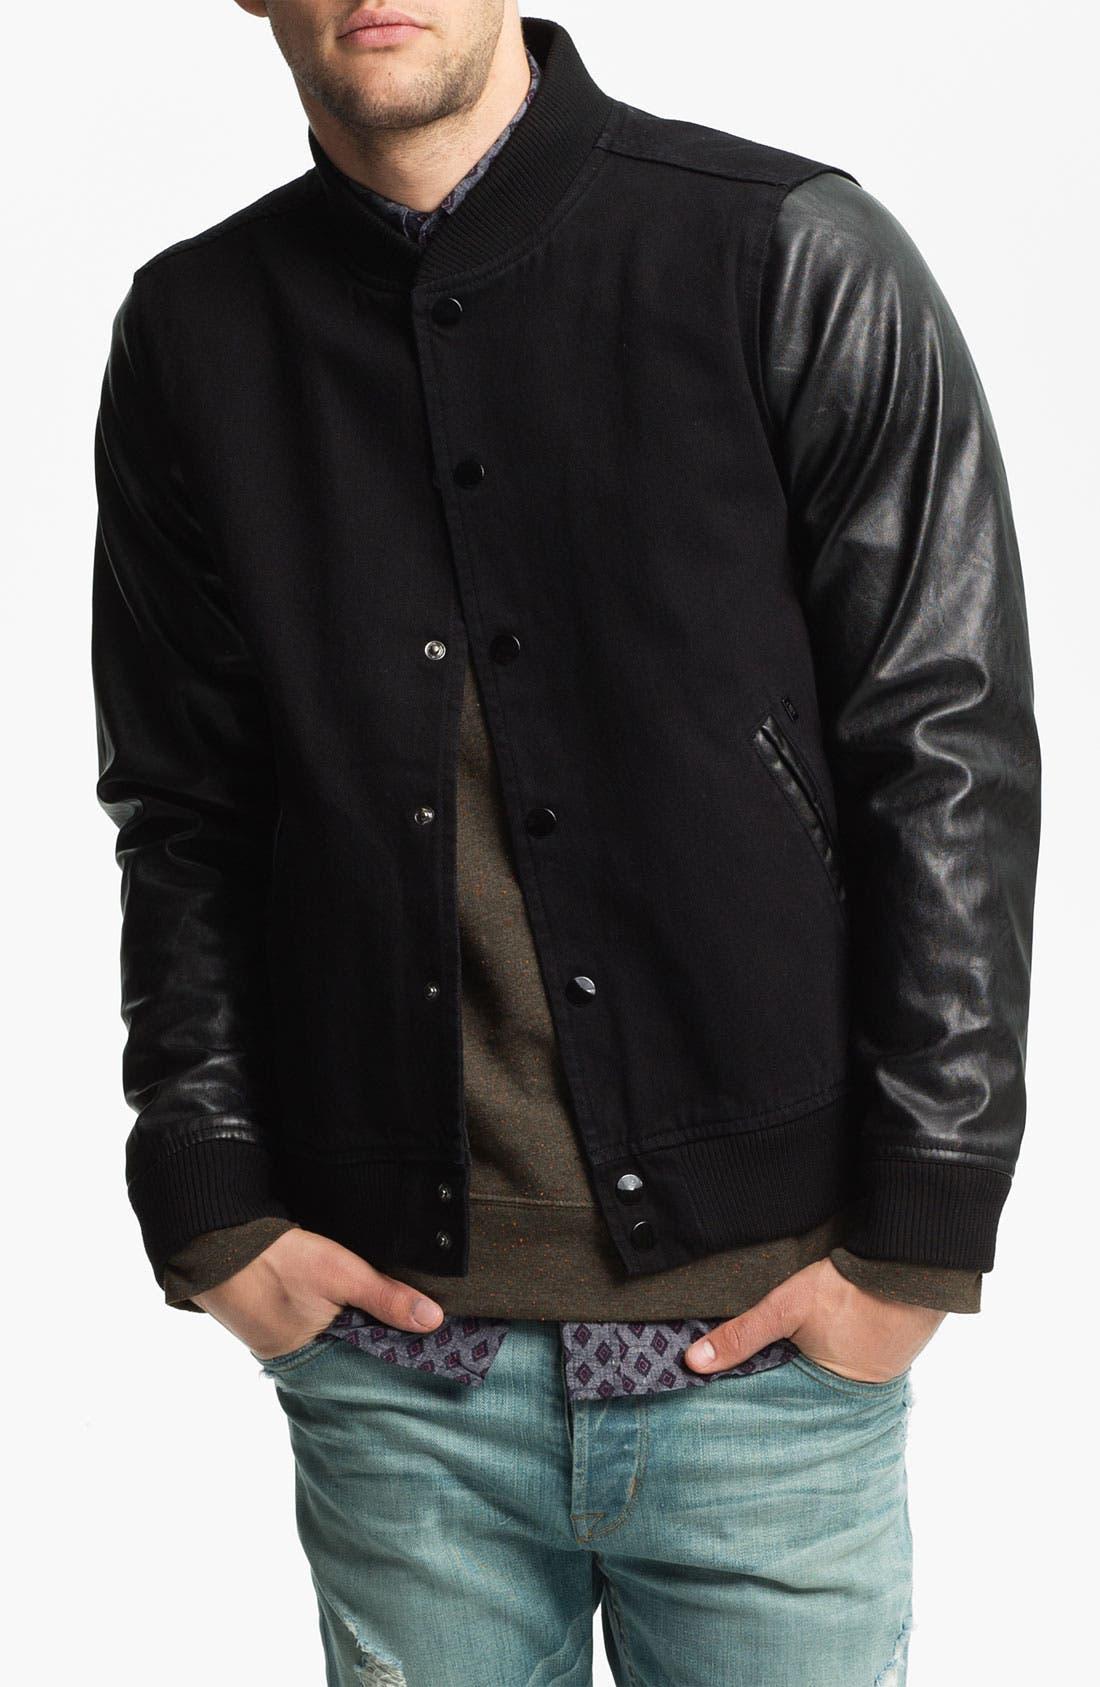 Alternate Image 1 Selected - Obey 'Youth' Varsity Jacket